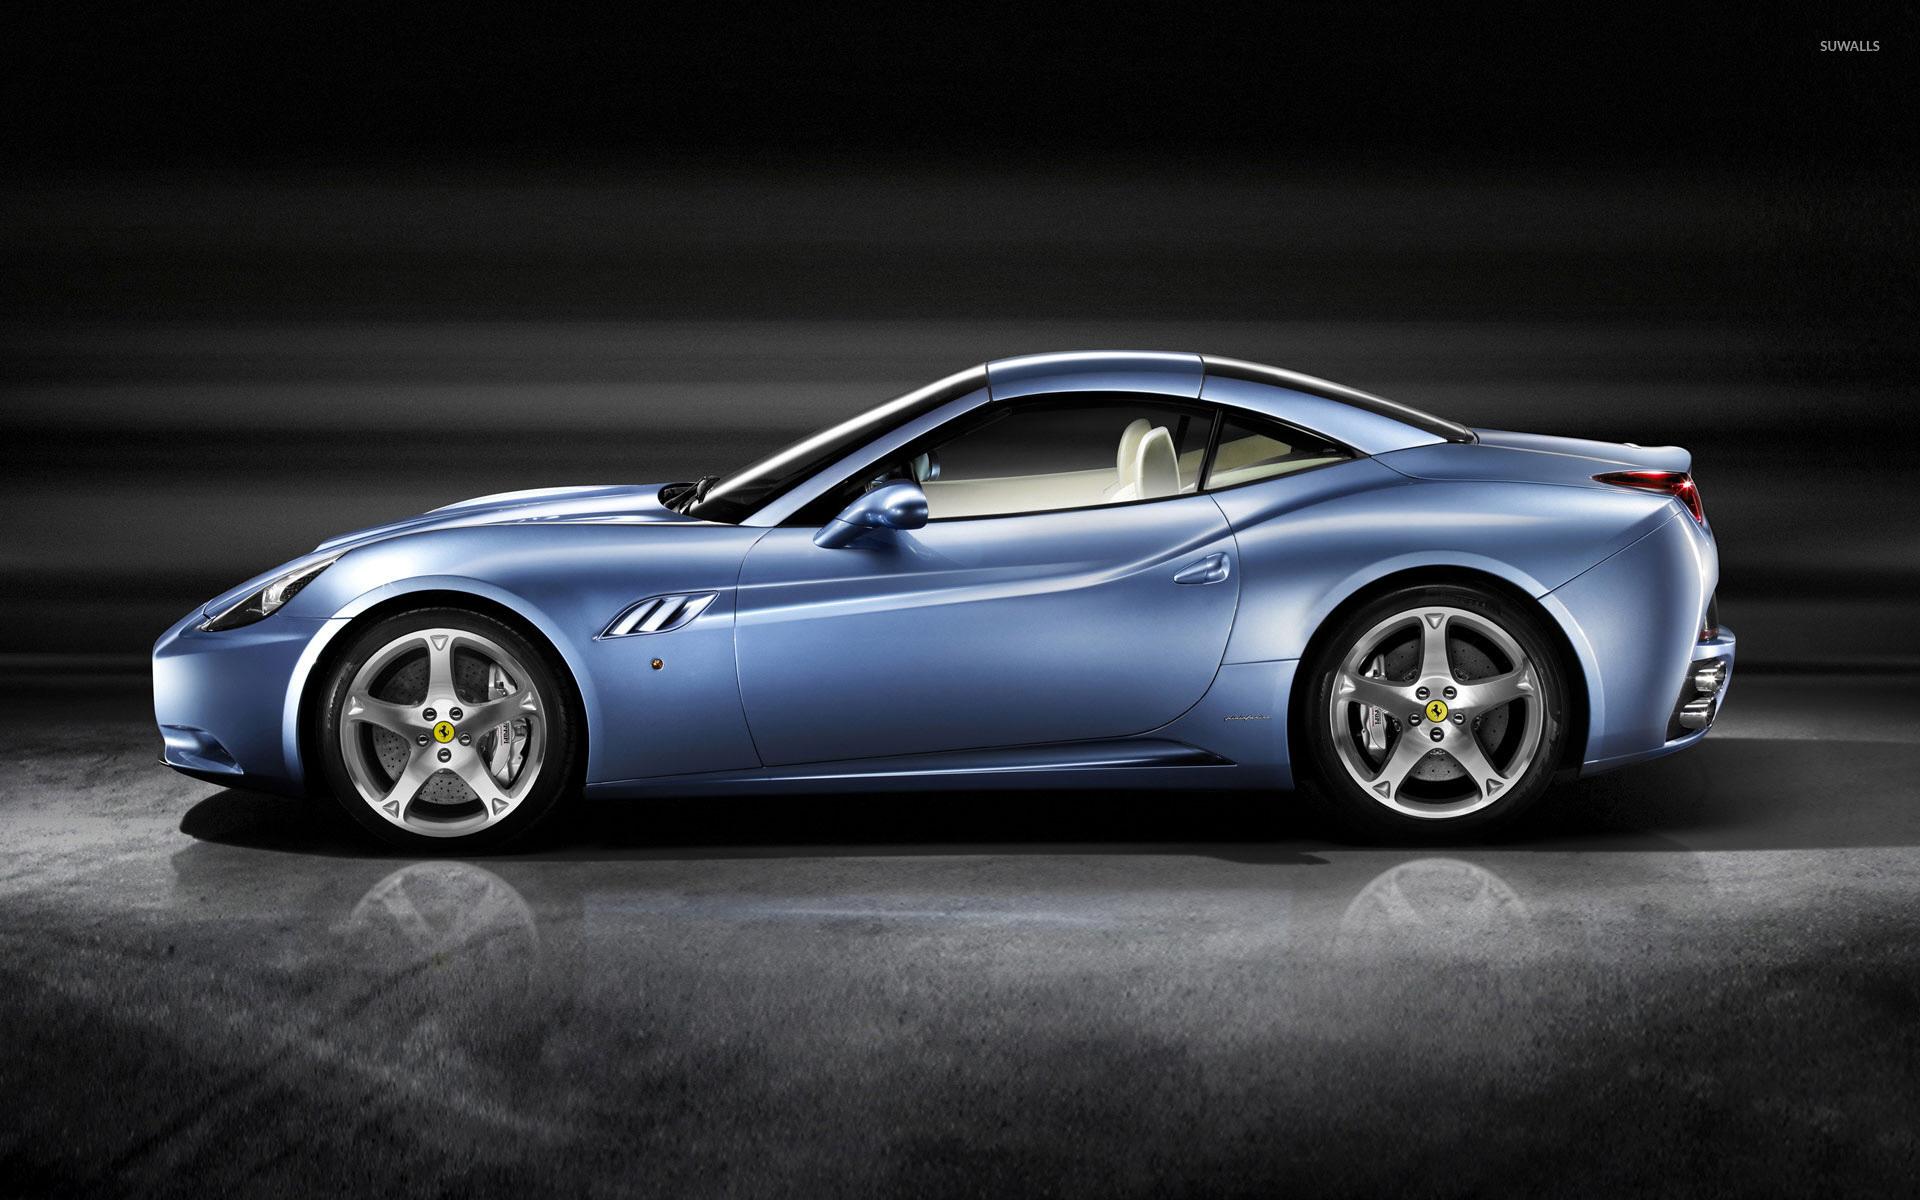 Ferrari california 3 wallpaper car wallpapers 9090 ferrari california 3 wallpaper voltagebd Gallery